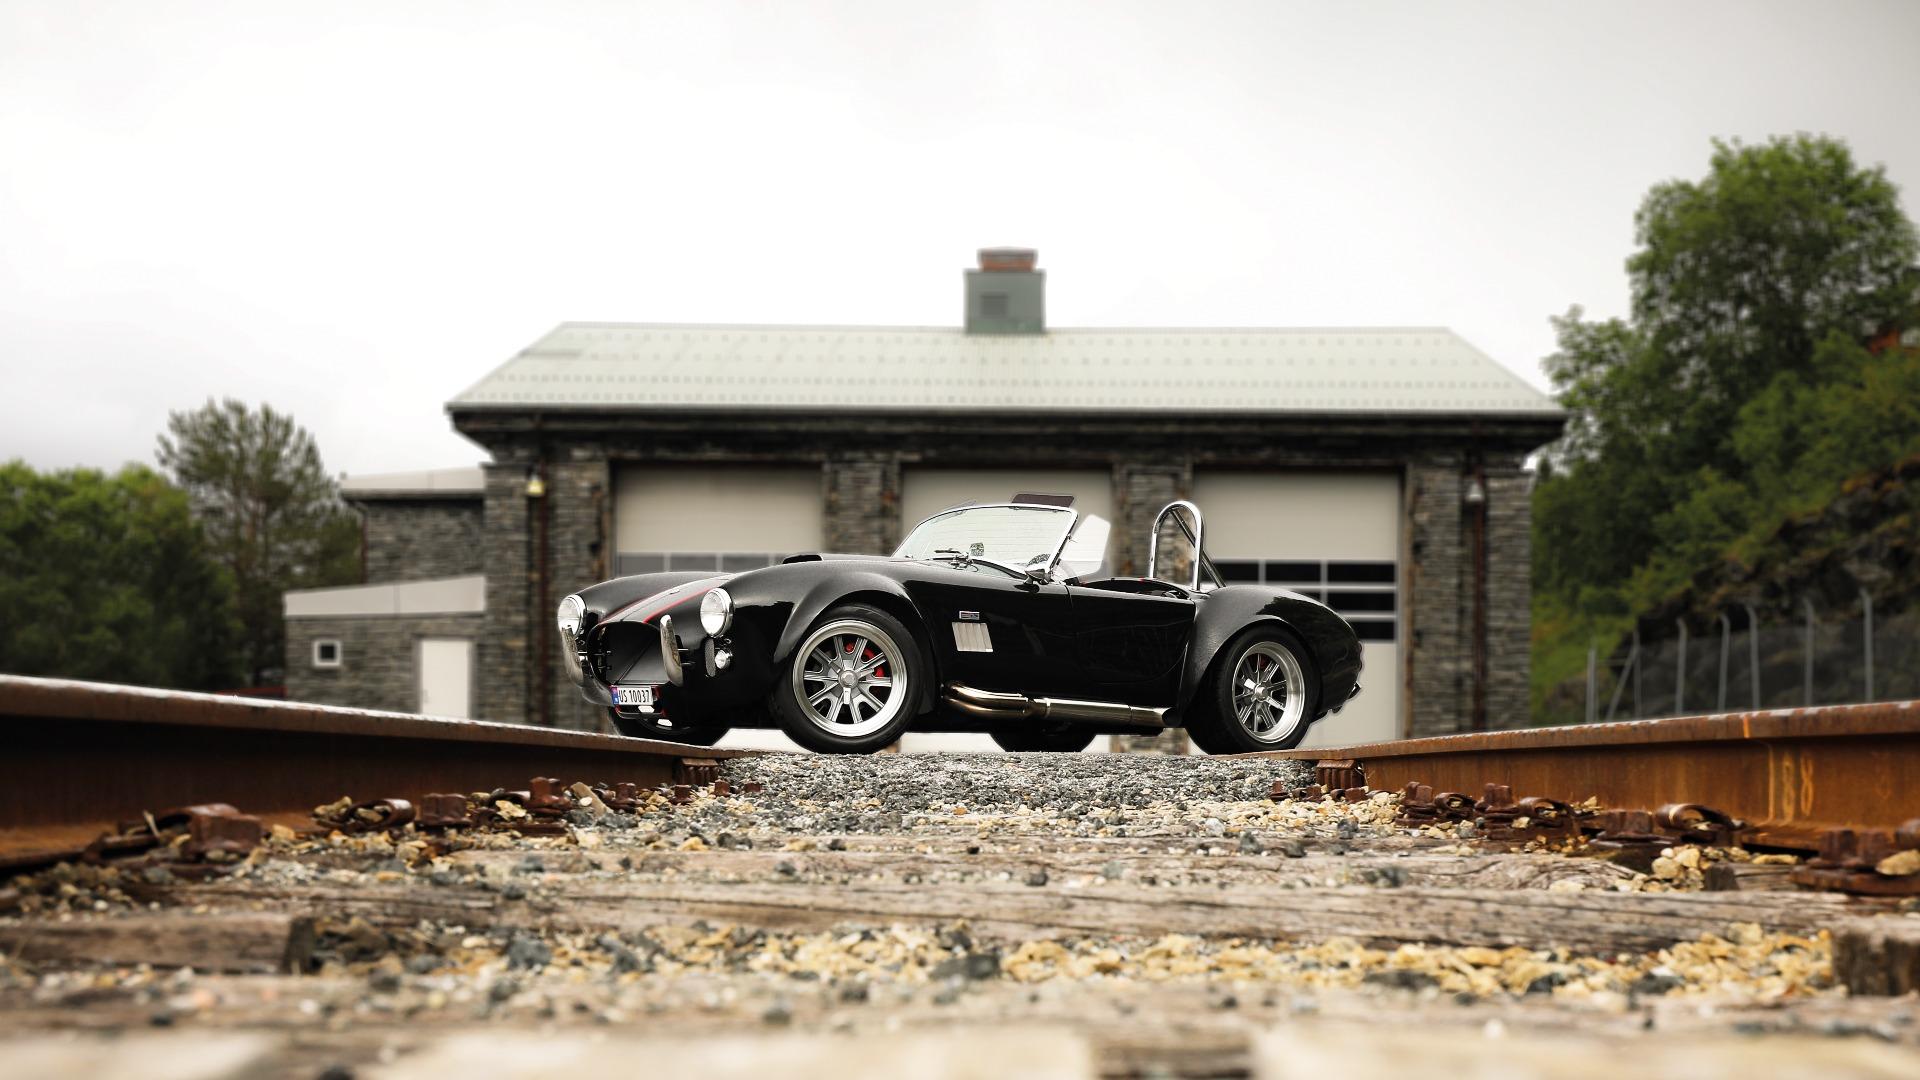 Neurotoxicity – 1965 427 SC Shelby Cobra